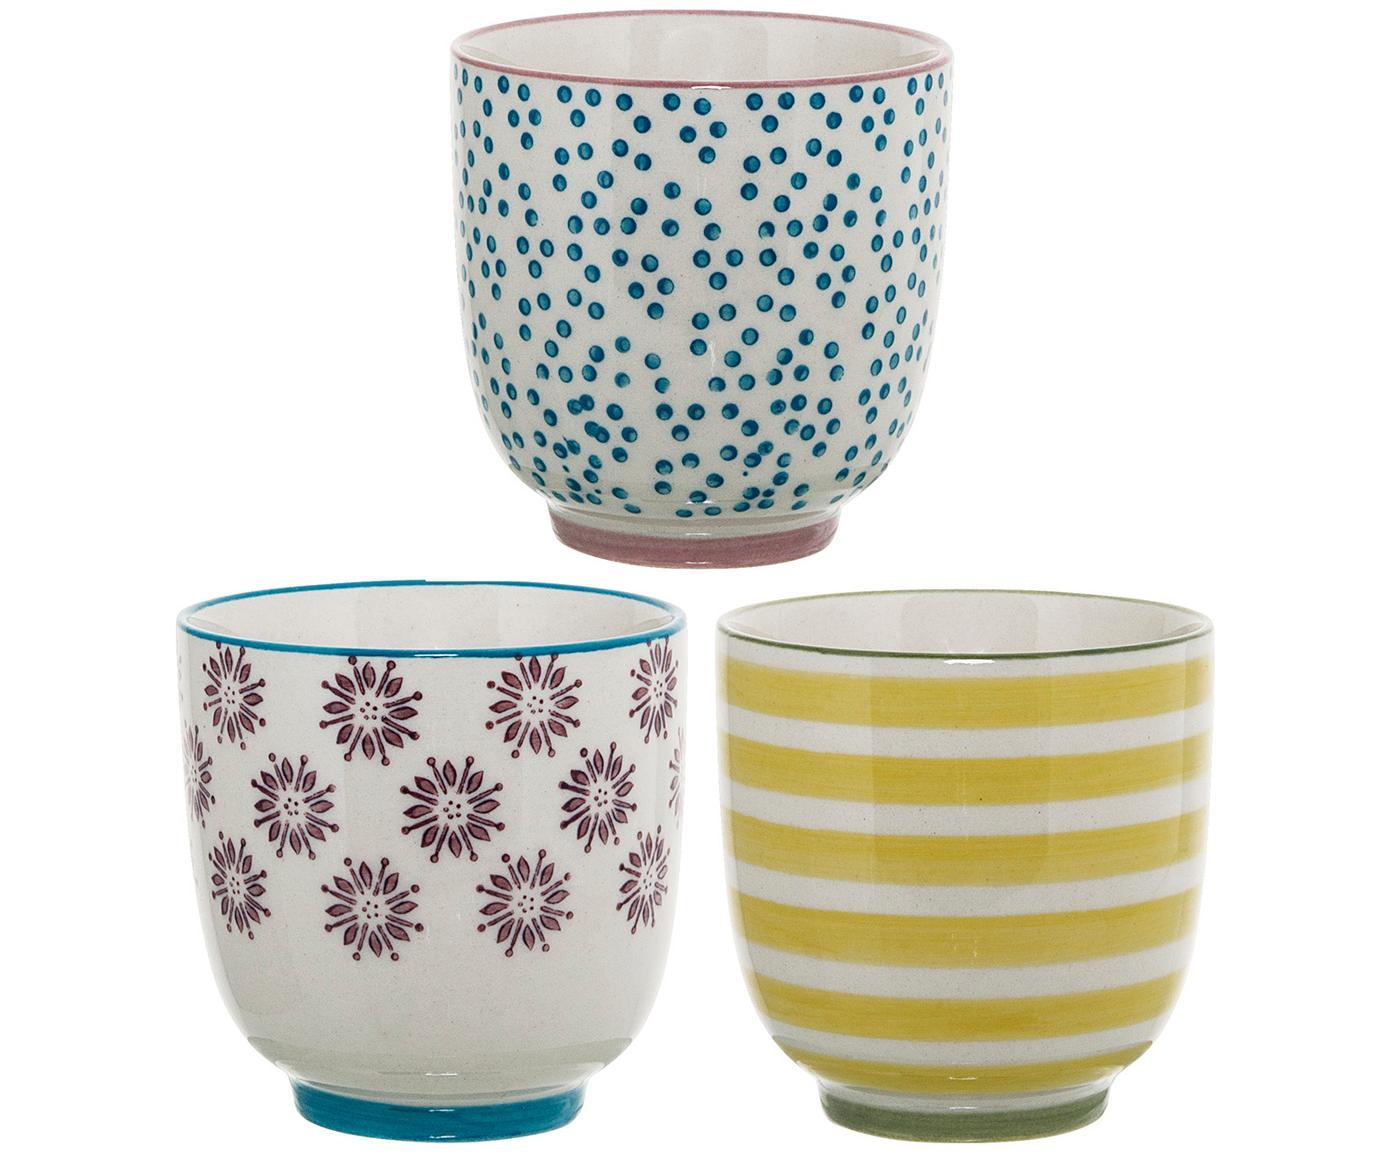 Set de tazas Patrizia, 3pzas., Gres, Blanco, azul, rojo, amarillo, Ø 7 x Al 7 cm